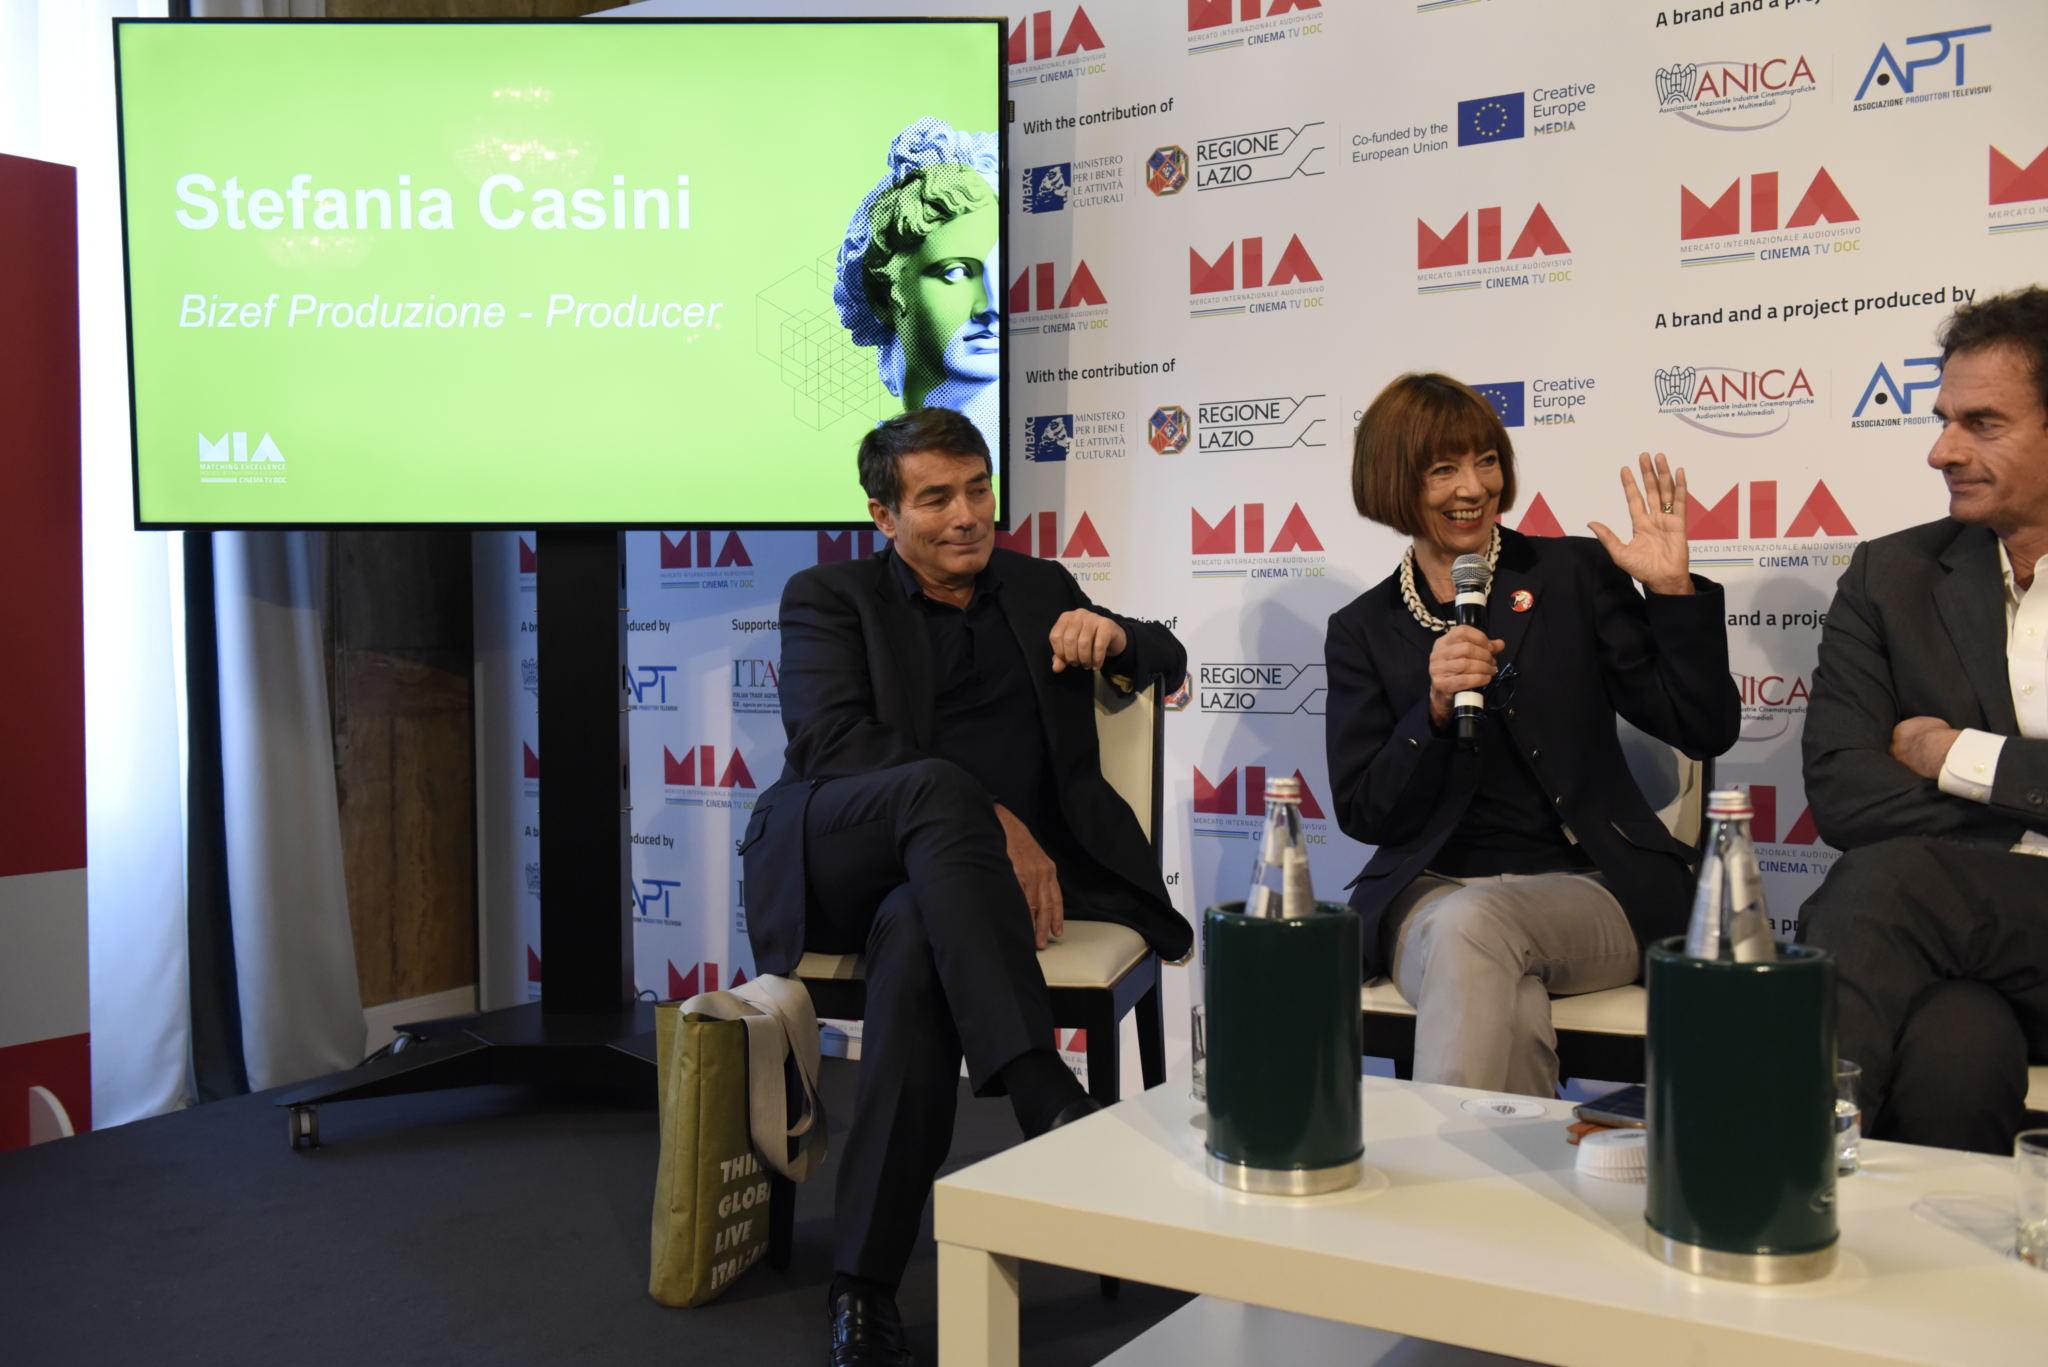 Duilio Giammaria, Stefania Casini, David Bogi